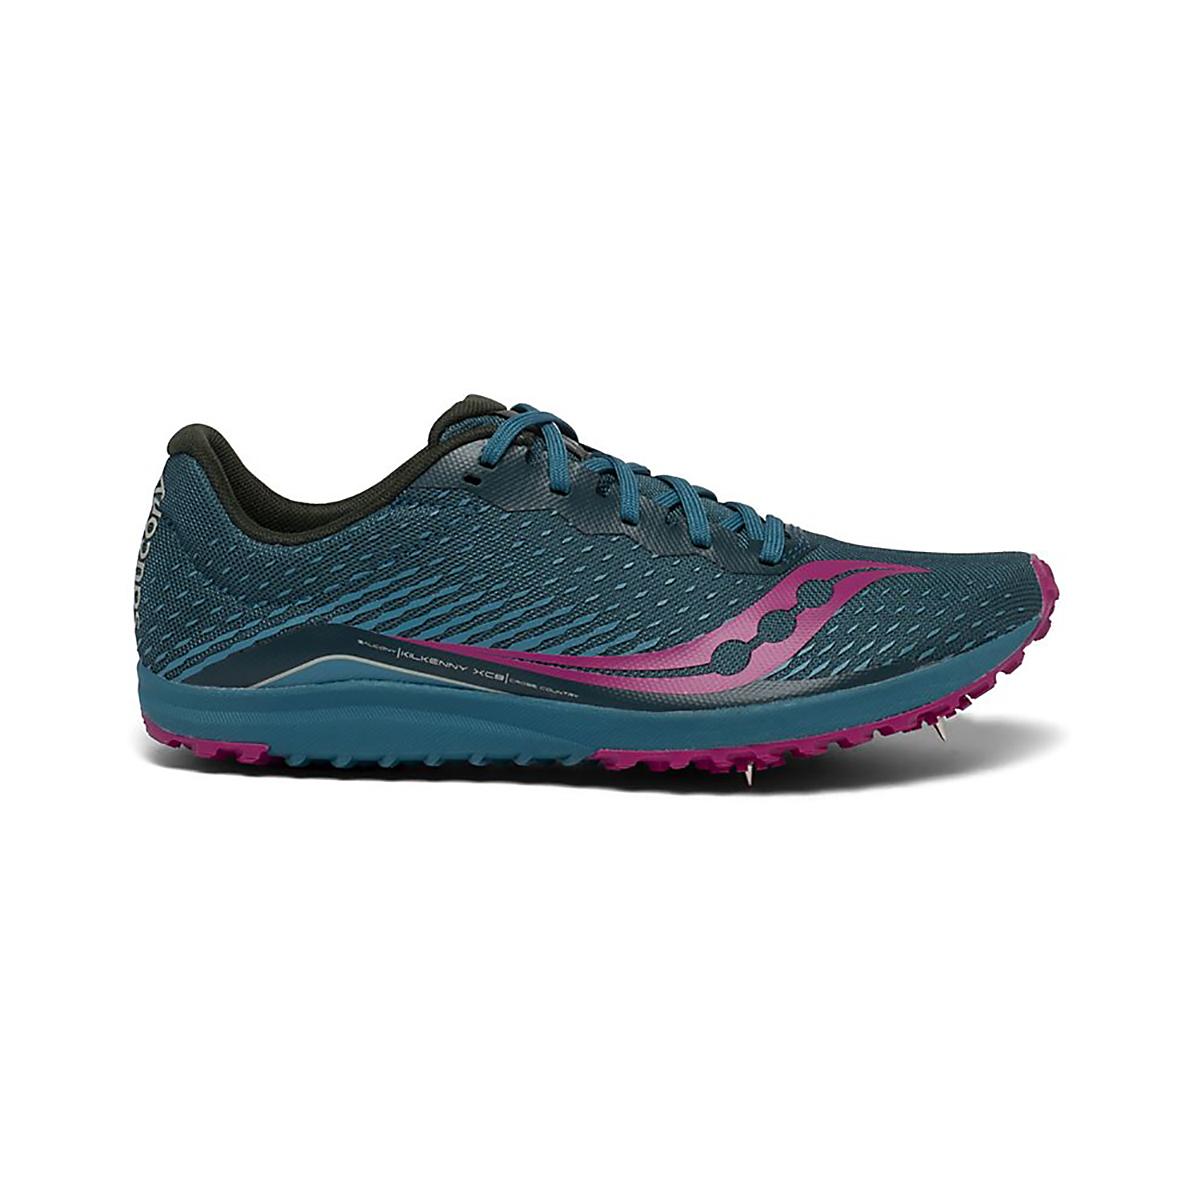 Women's Saucony Kilkenny XC8 Spike Shoes - Color: Marine - Size: 5 - Width: Regular, Marine, large, image 1